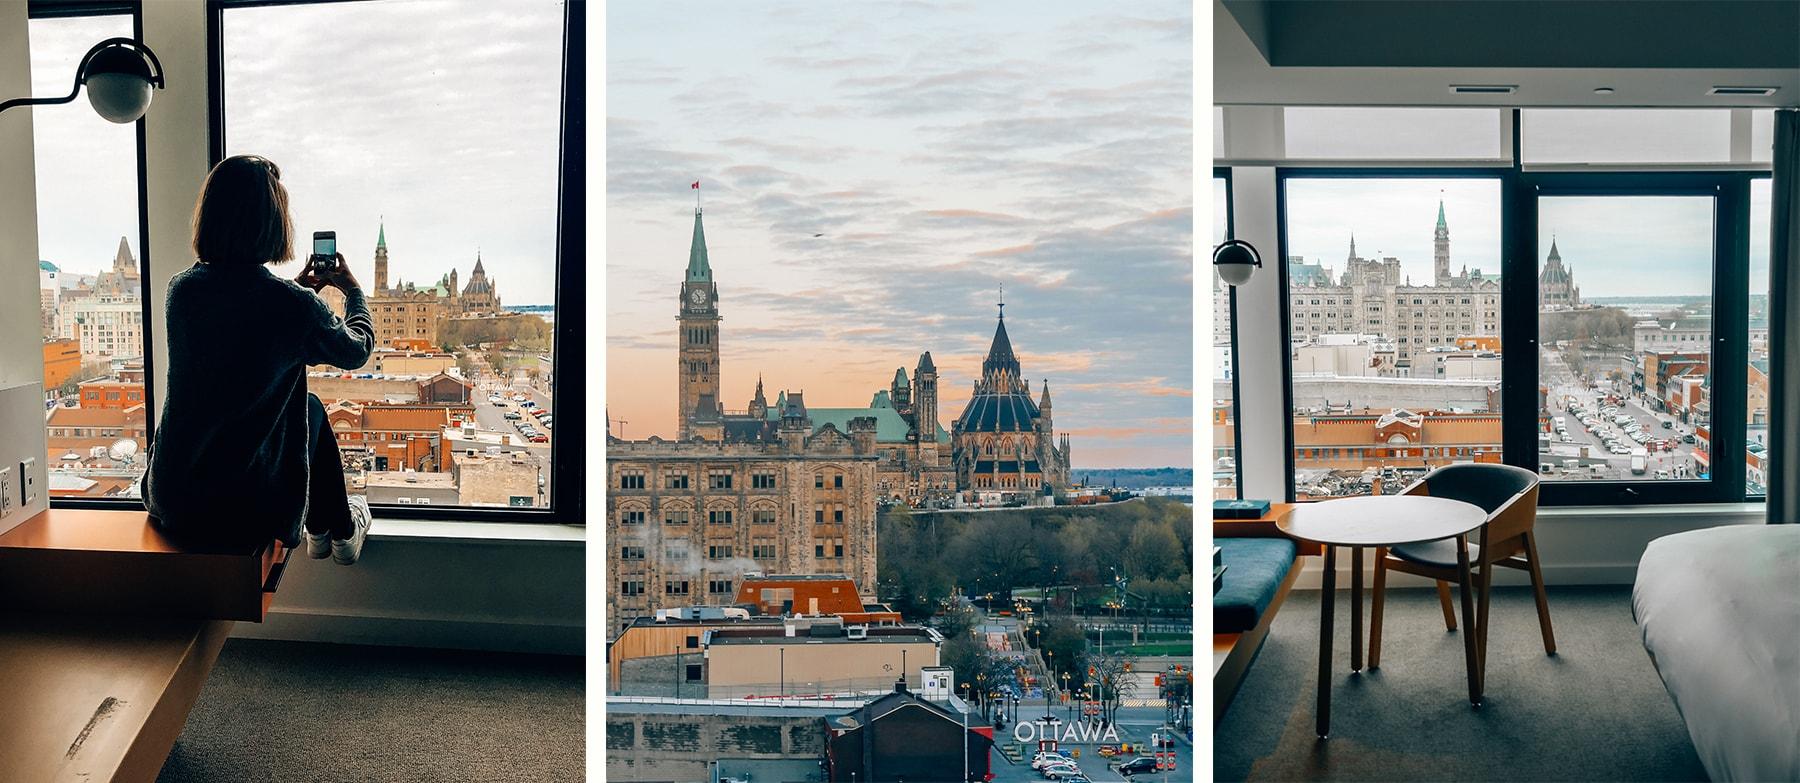 Hotel Ottawa